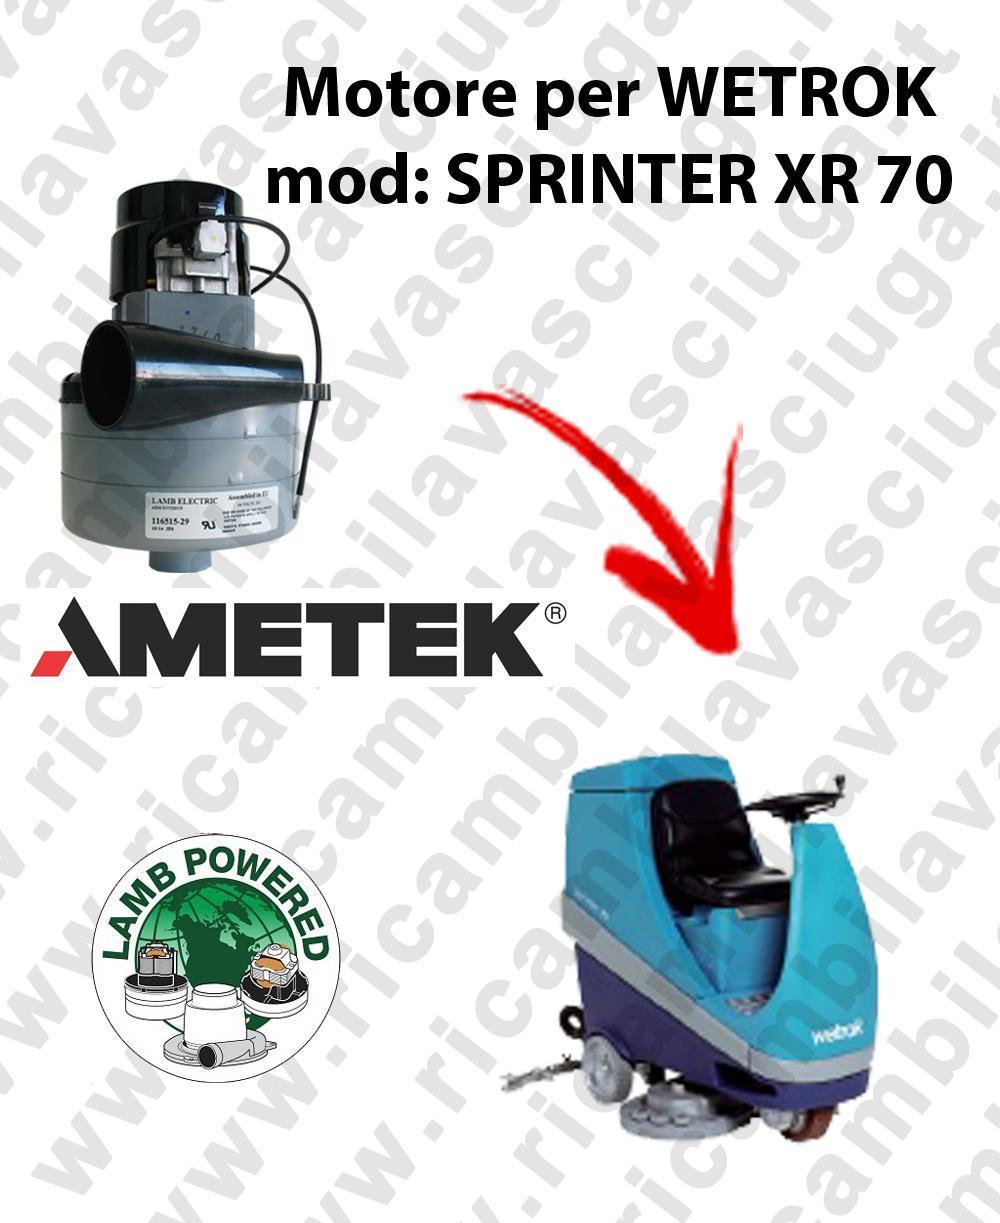 SPRINTER XR 70 Saugmotor LAMB AMETEK für scheuersaugmaschinen WETROK